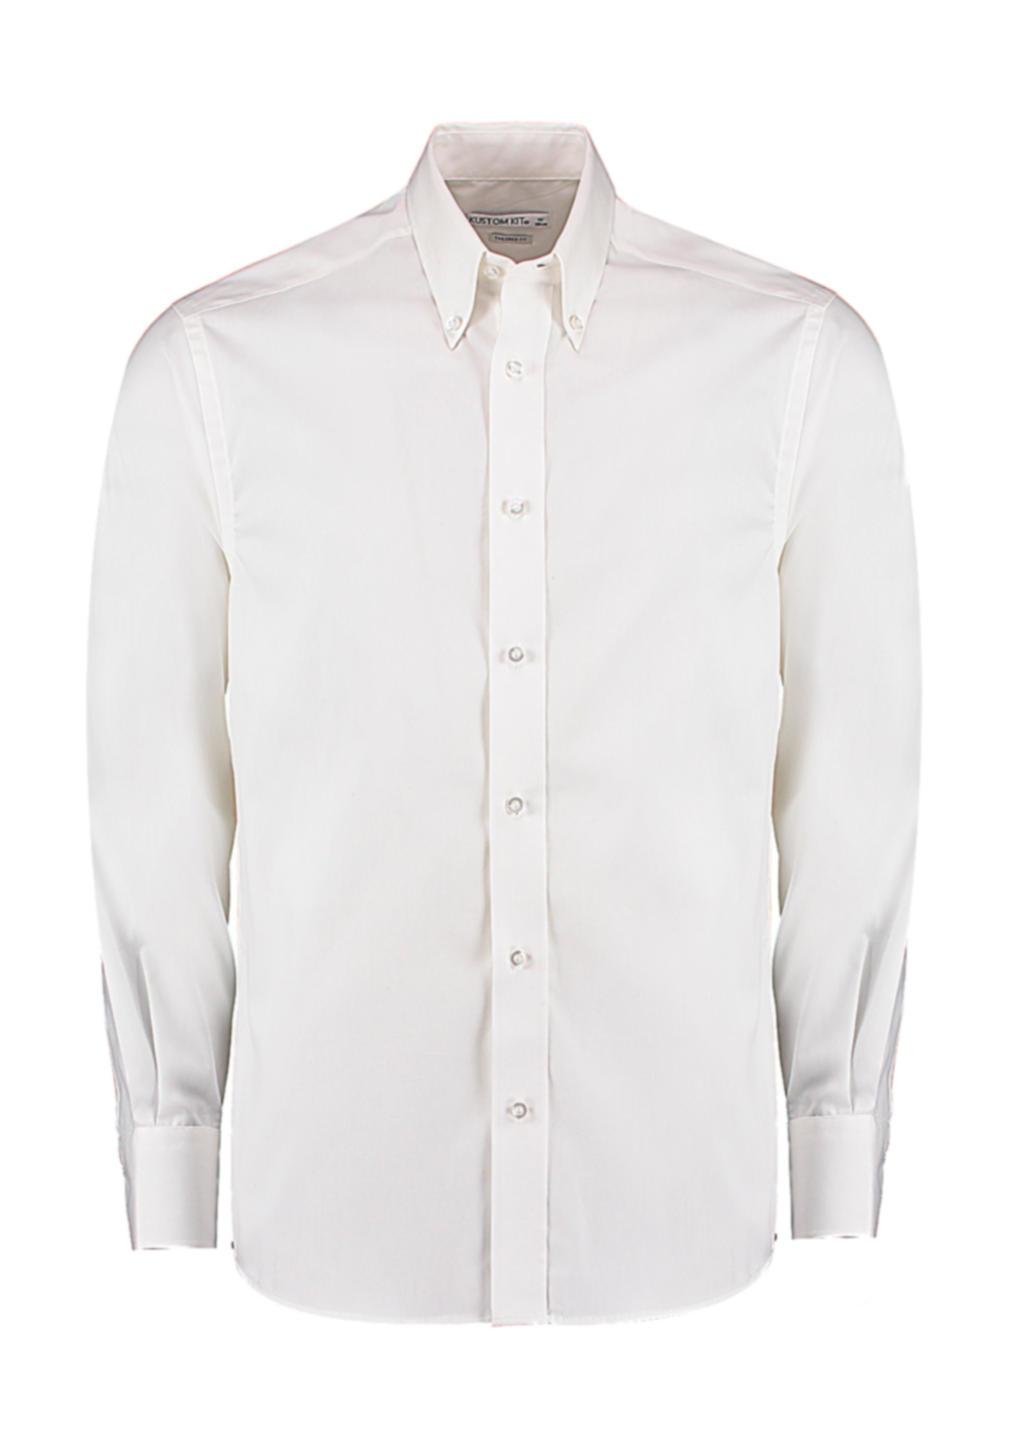 Tailored Fit Premium Oxford Shirt